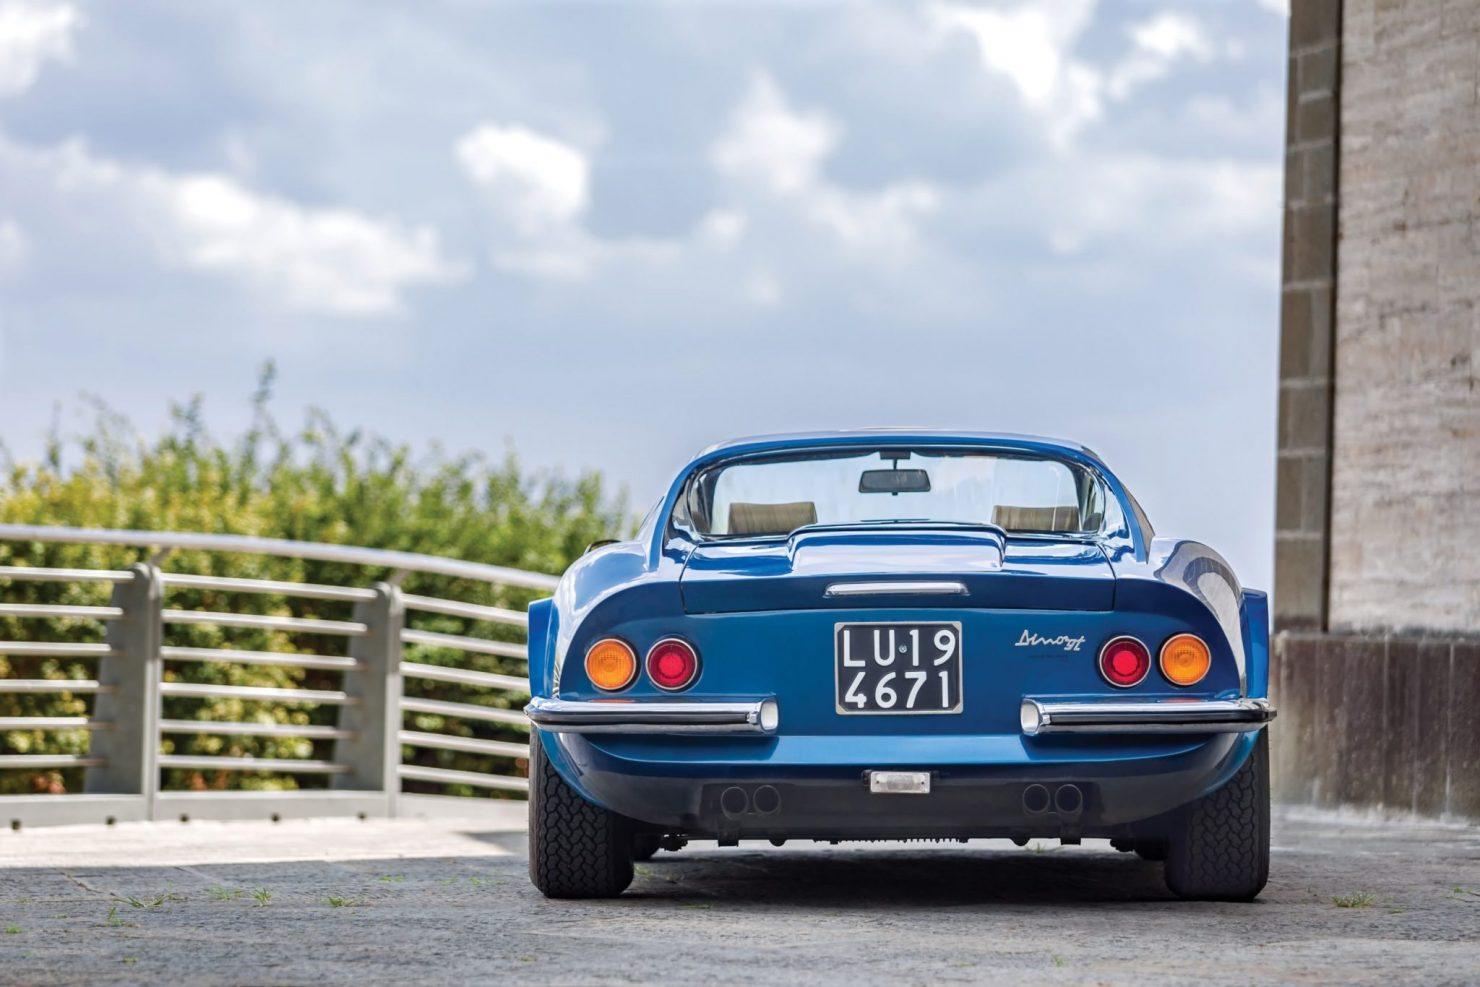 ferrari dino 246 gts car 9 1480x987 - 1973 Ferrari Dino 246 GTS